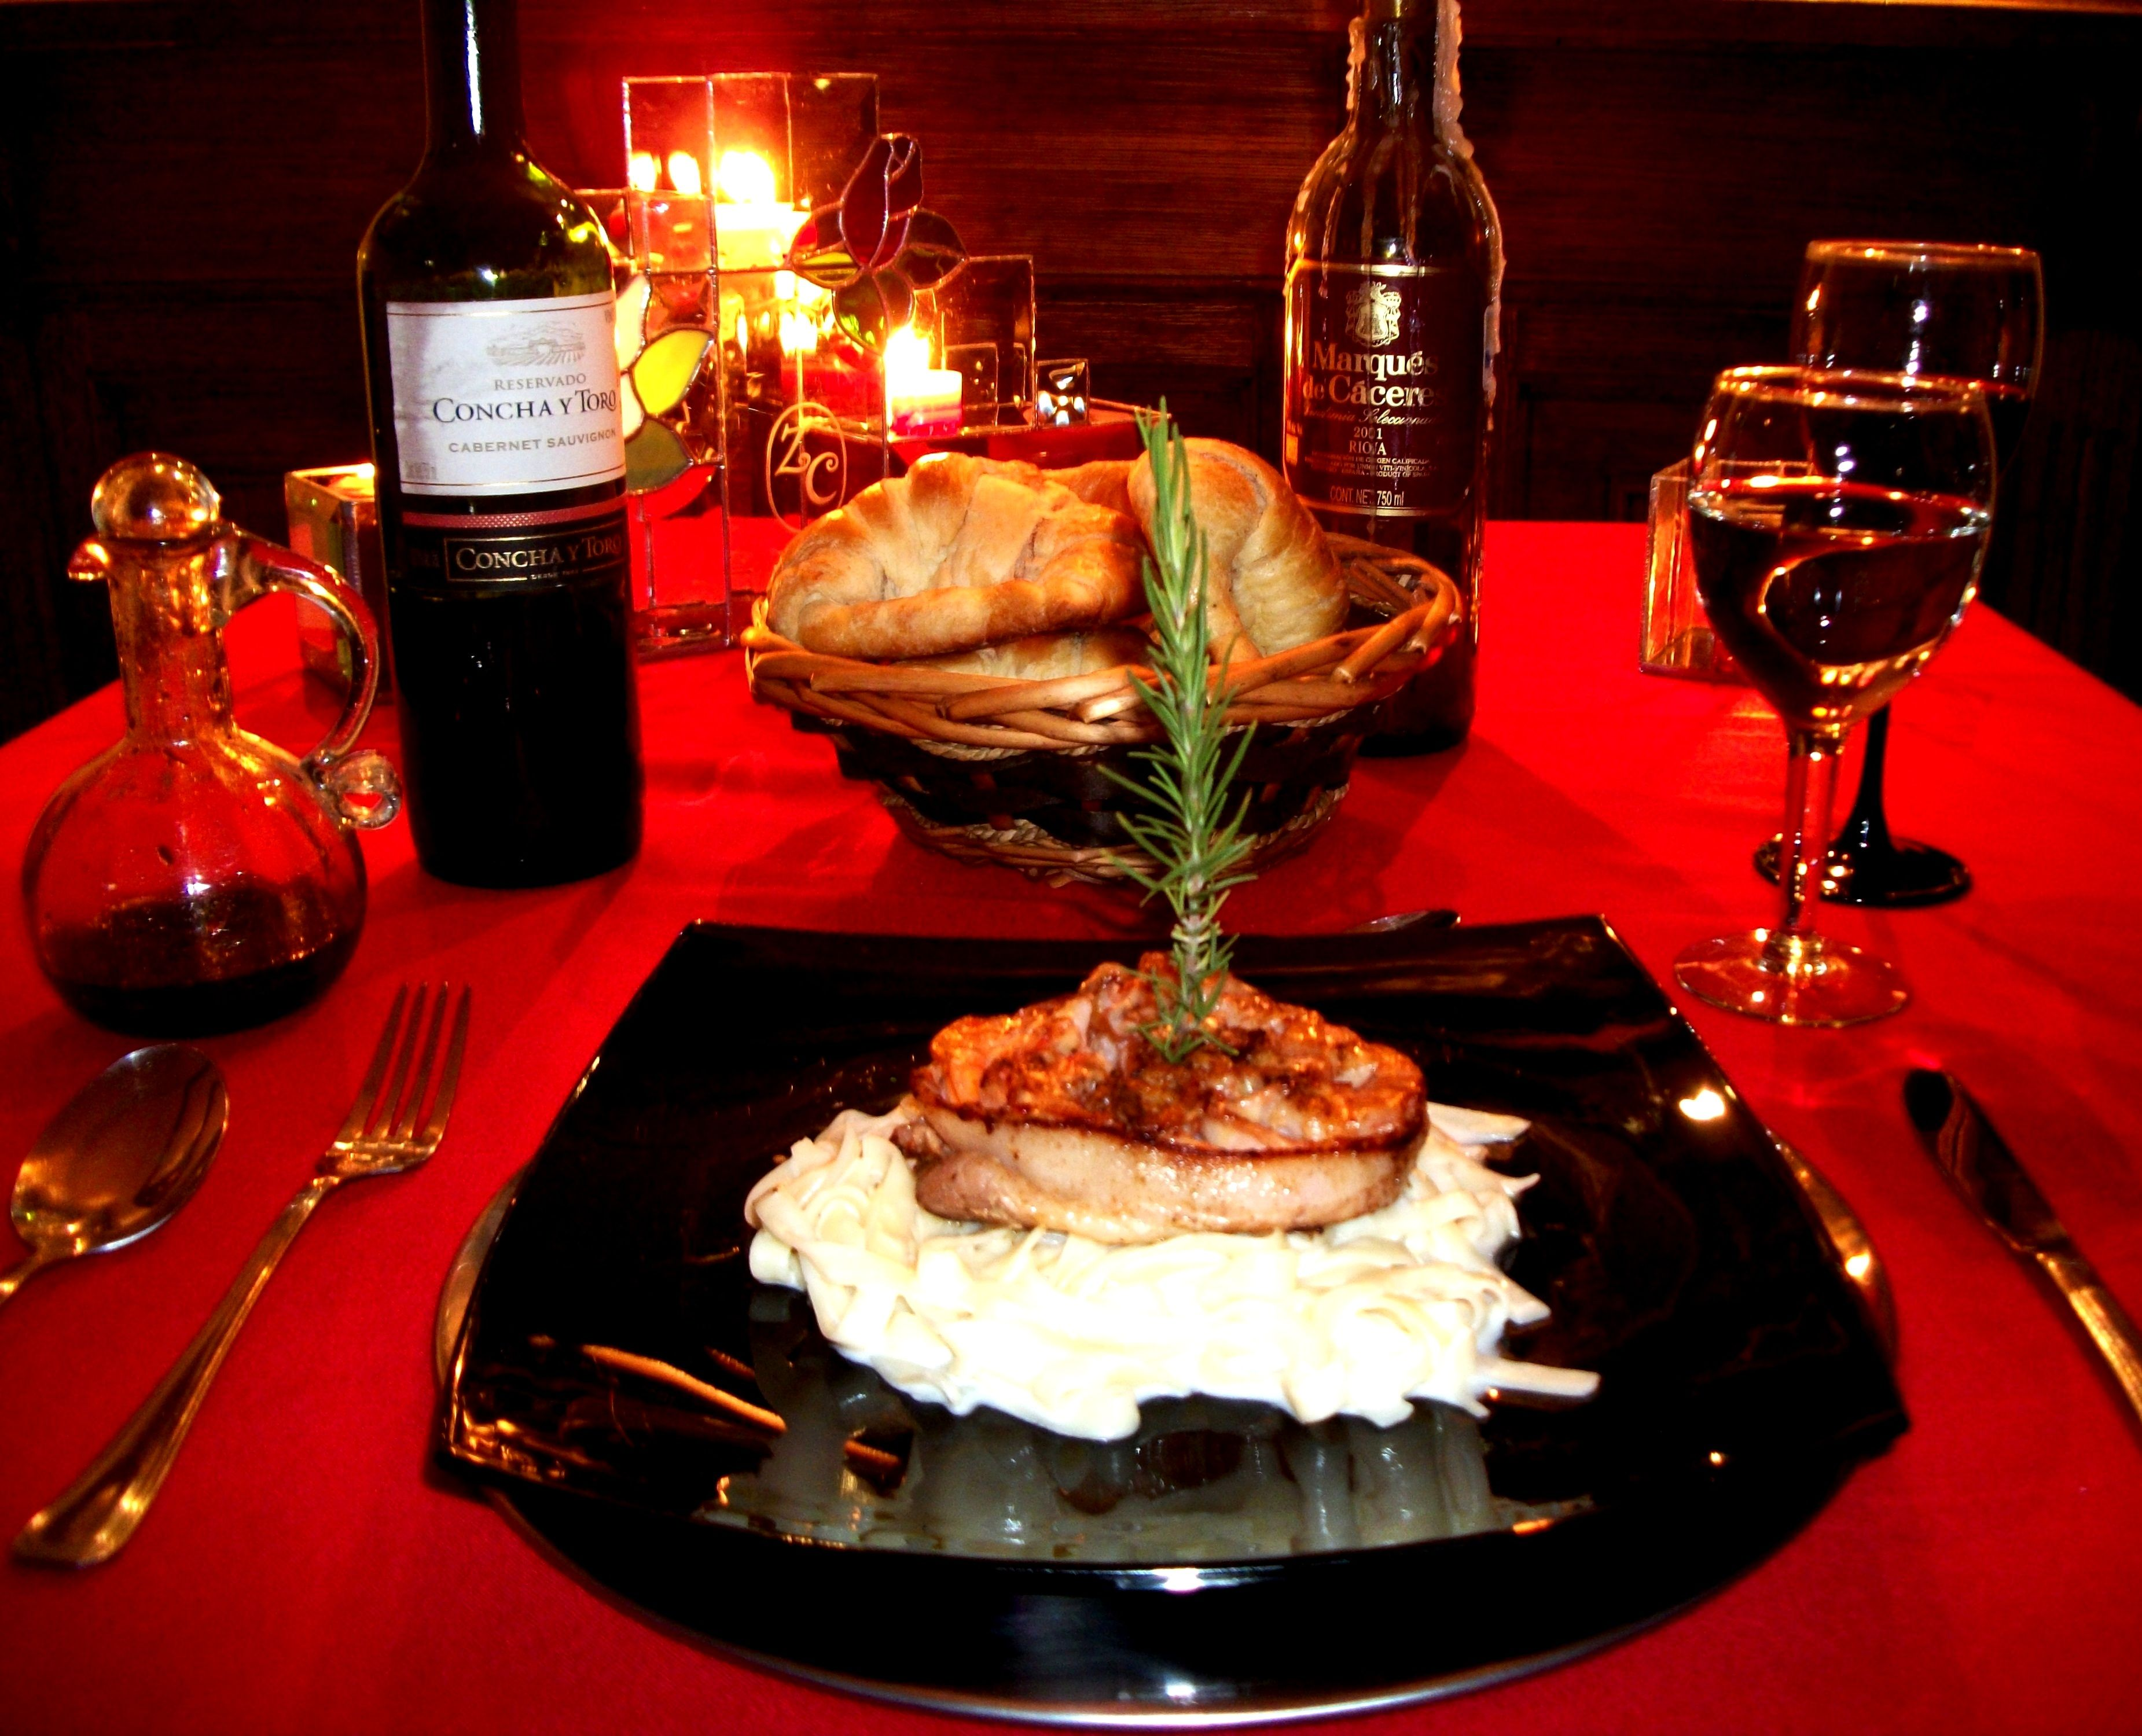 Cenas romanticas medall n de camar n con fetuchini - Detalles para cena romantica ...